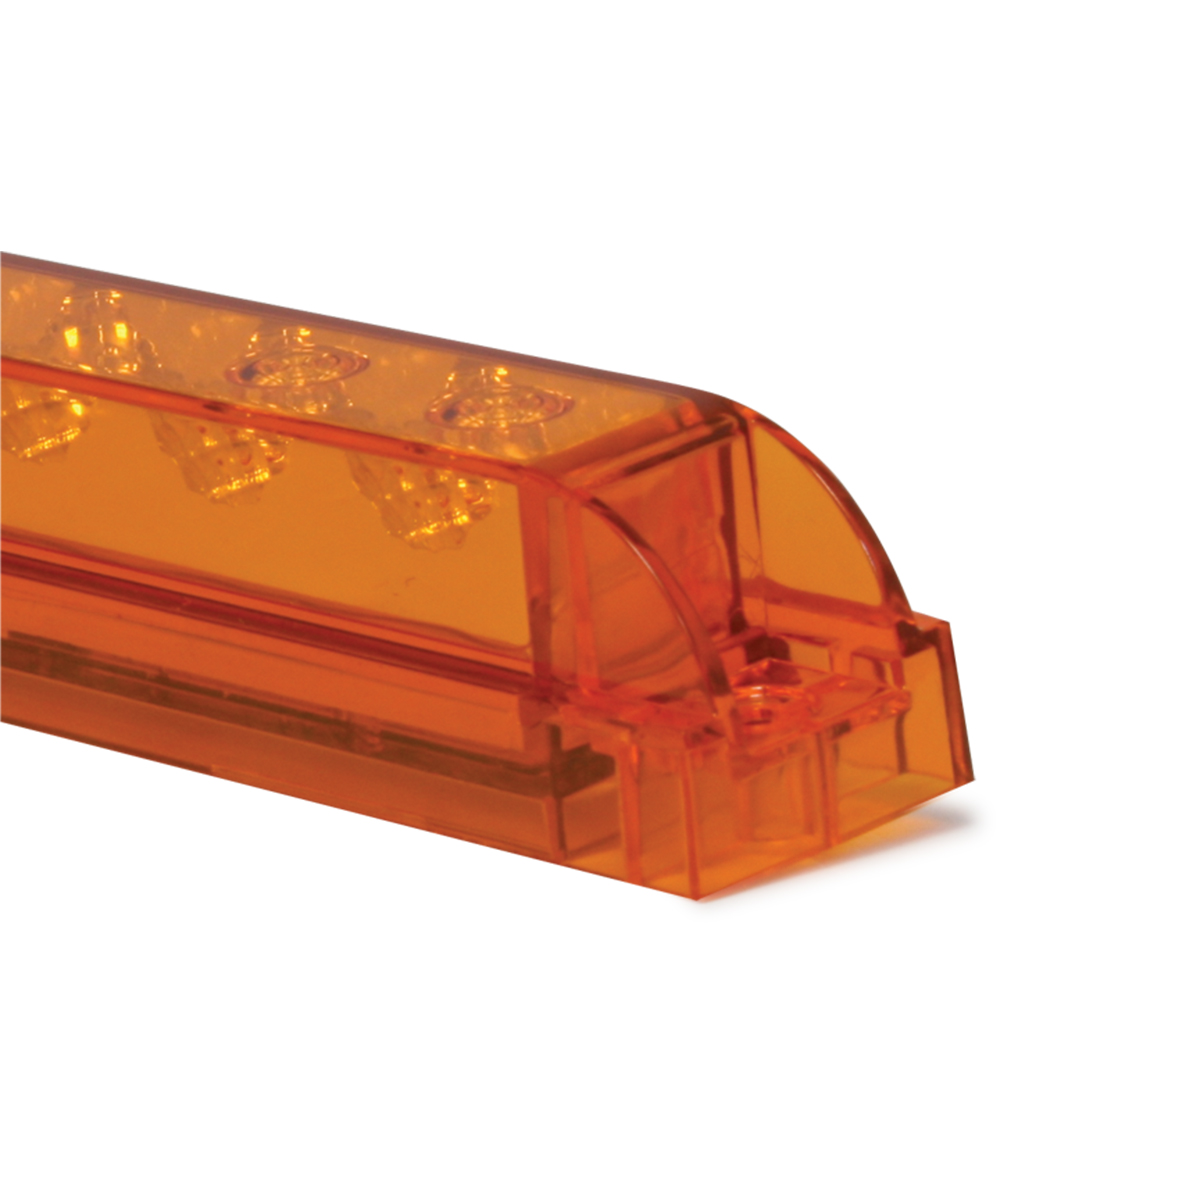 "76980 20"" Spyder LED Light Bar"